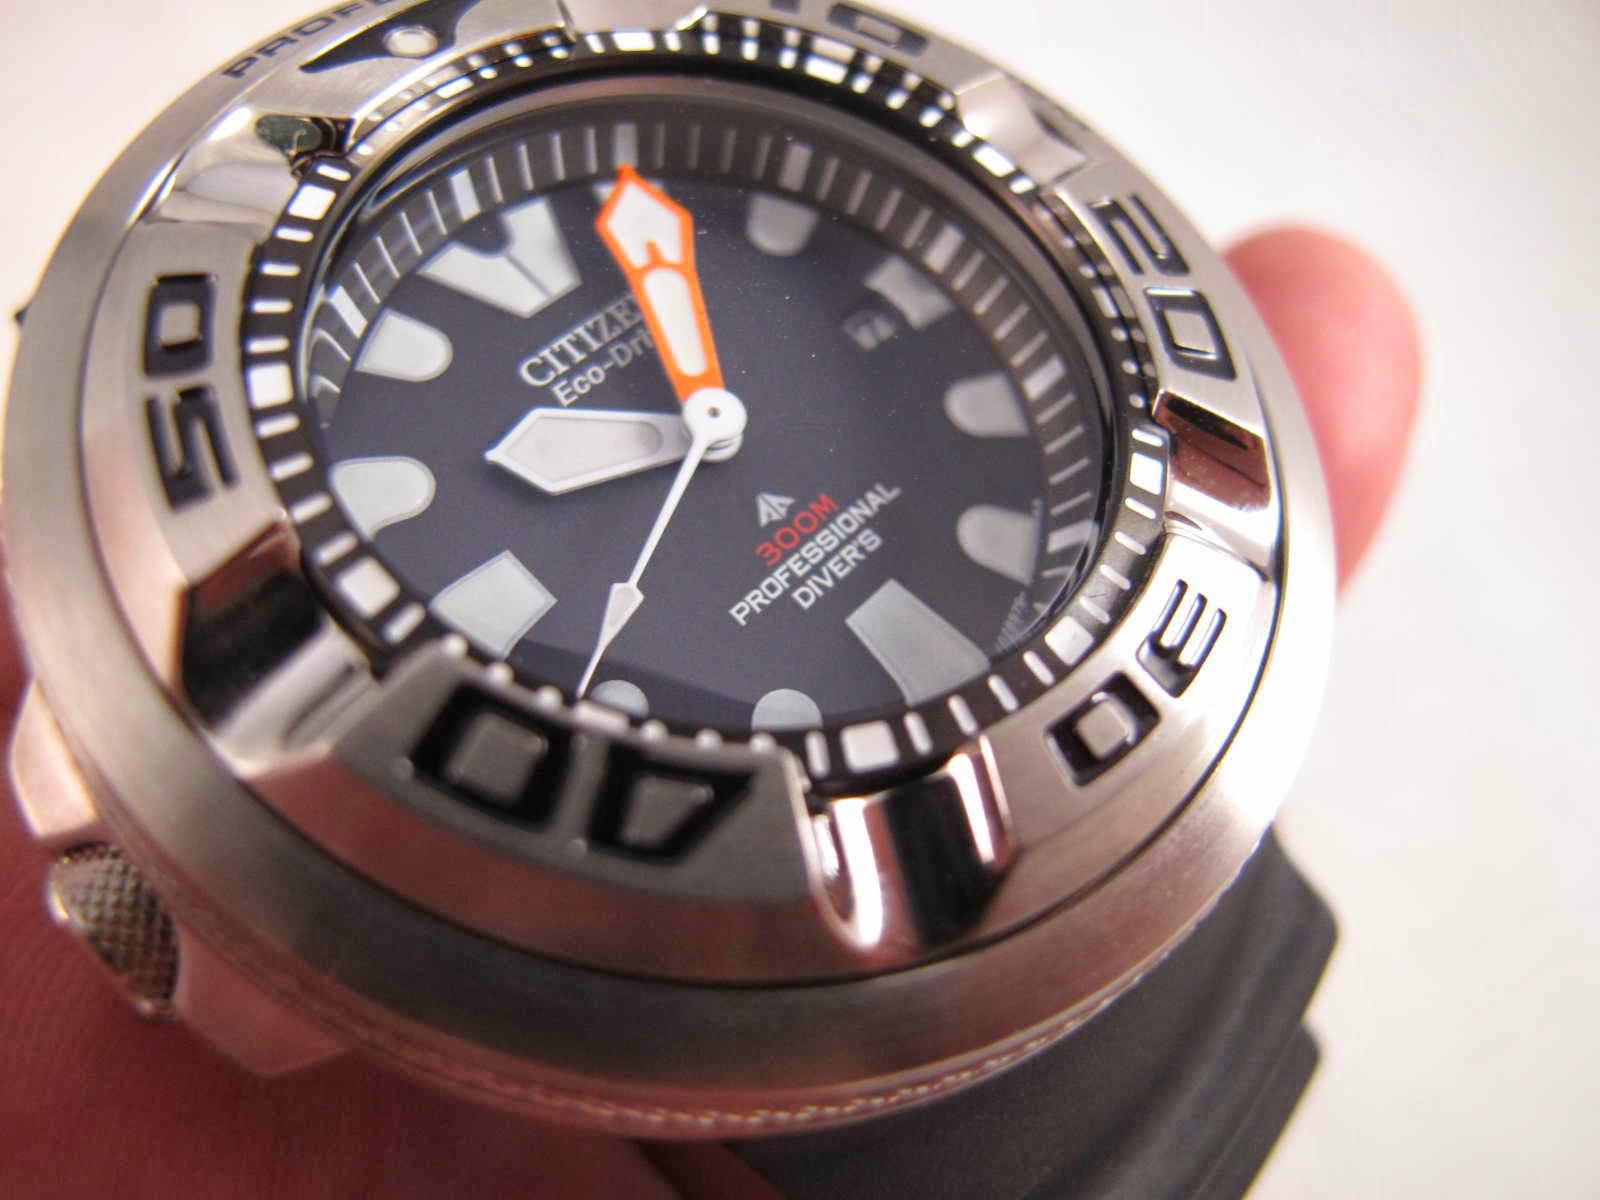 Kondisi Citizen Ecozilla SS ini Brand New Watch lengkap dengan box manual dan warranty card Cocok untuk Anda yang sedang mencari jam tangan Diver